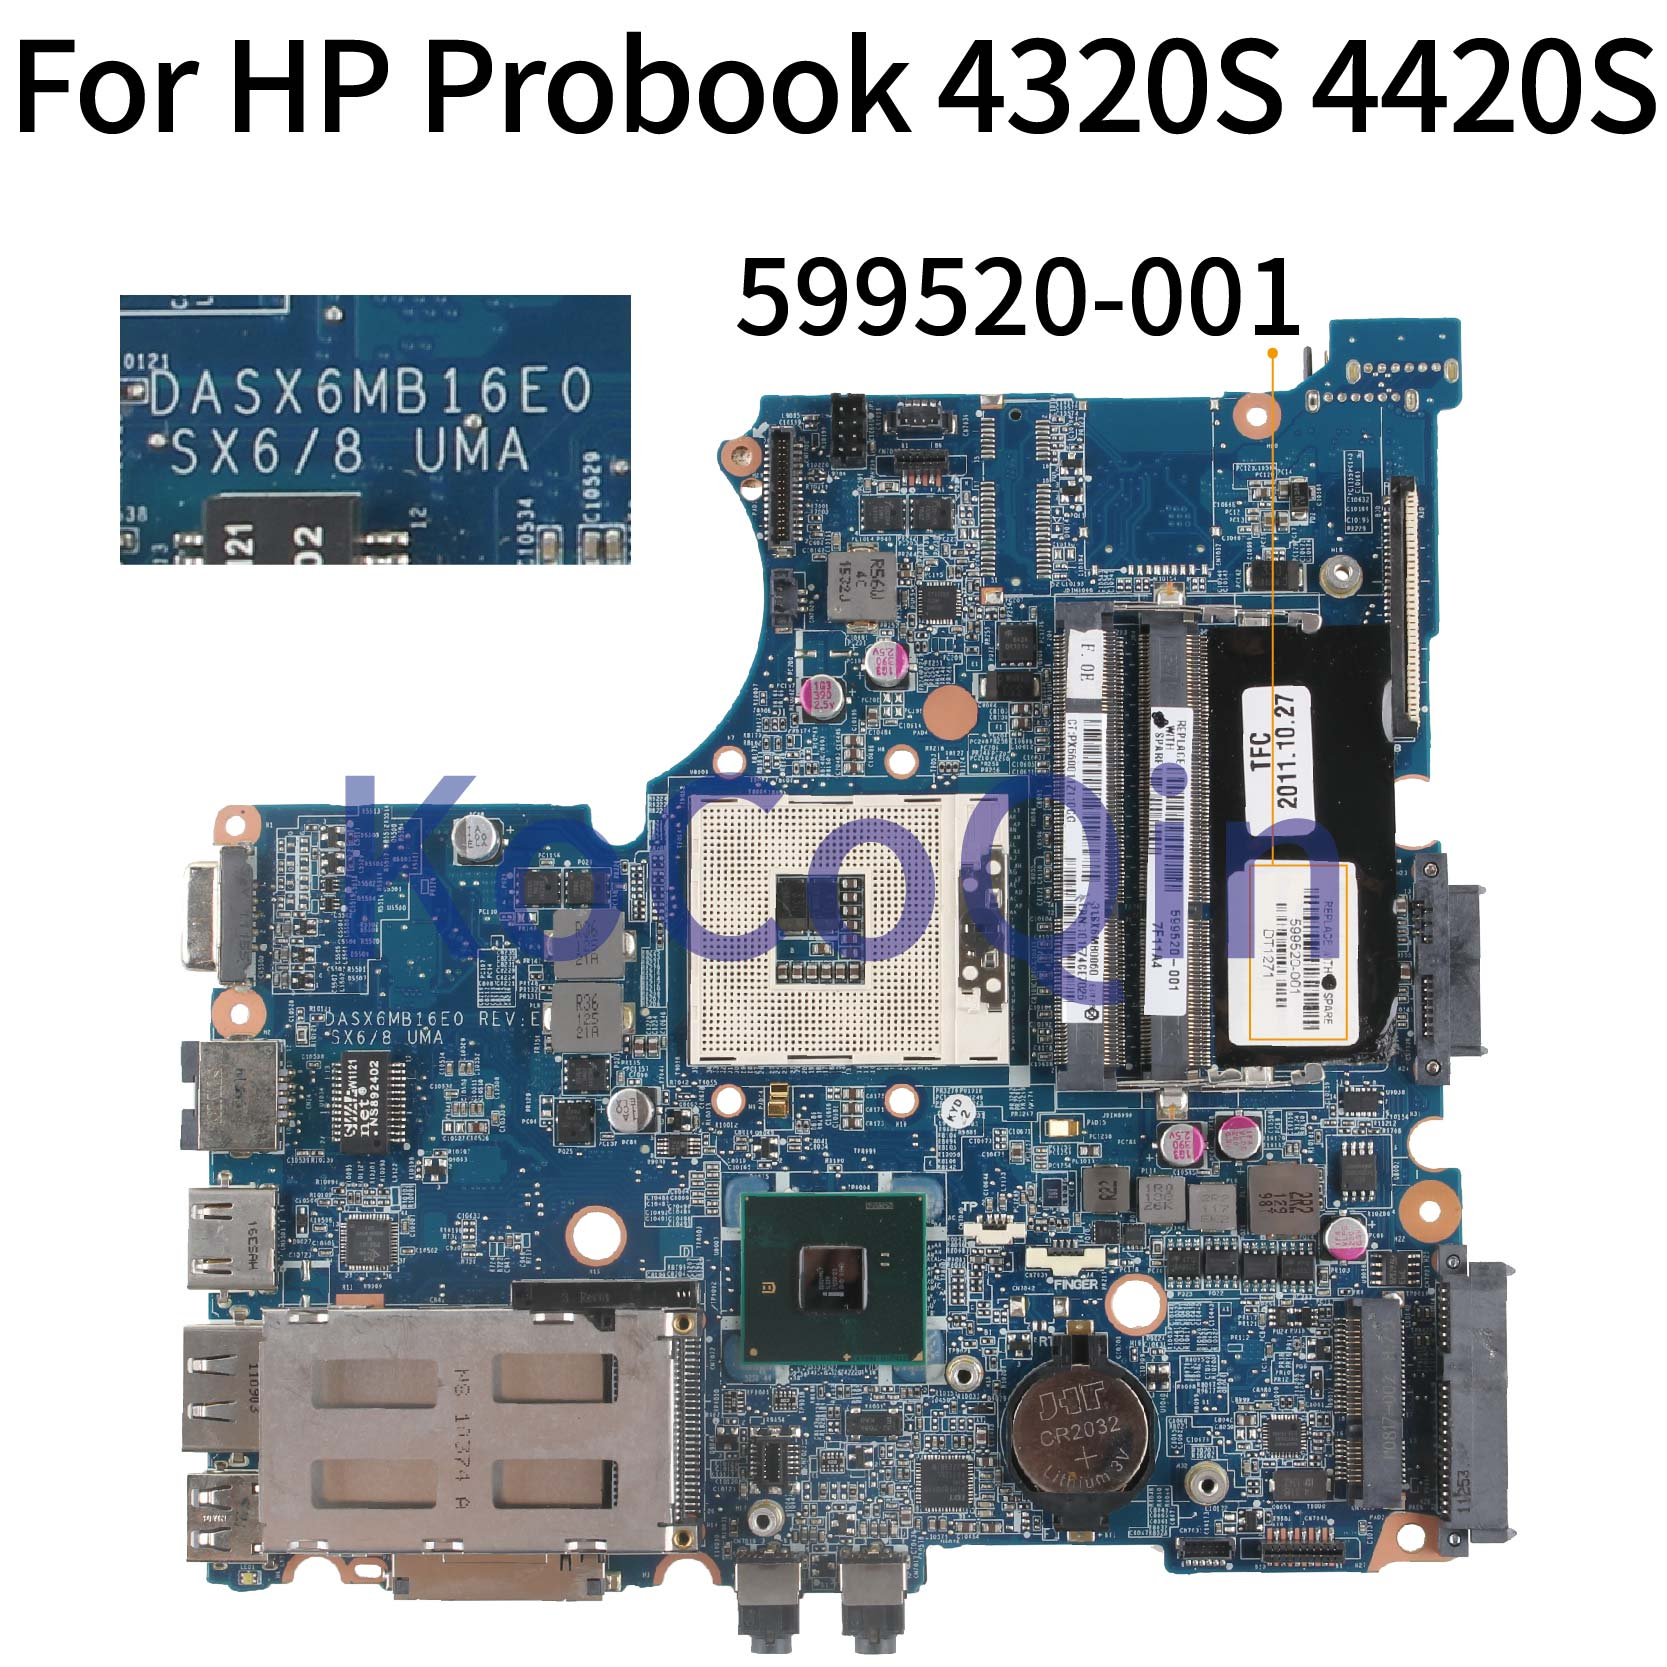 KoCoQin Laptop motherboard Für HP Probook 4320S 4321S 4420S HM57 Mainboard 599520-001 599520-001 DASX6MB16E0 DDR3